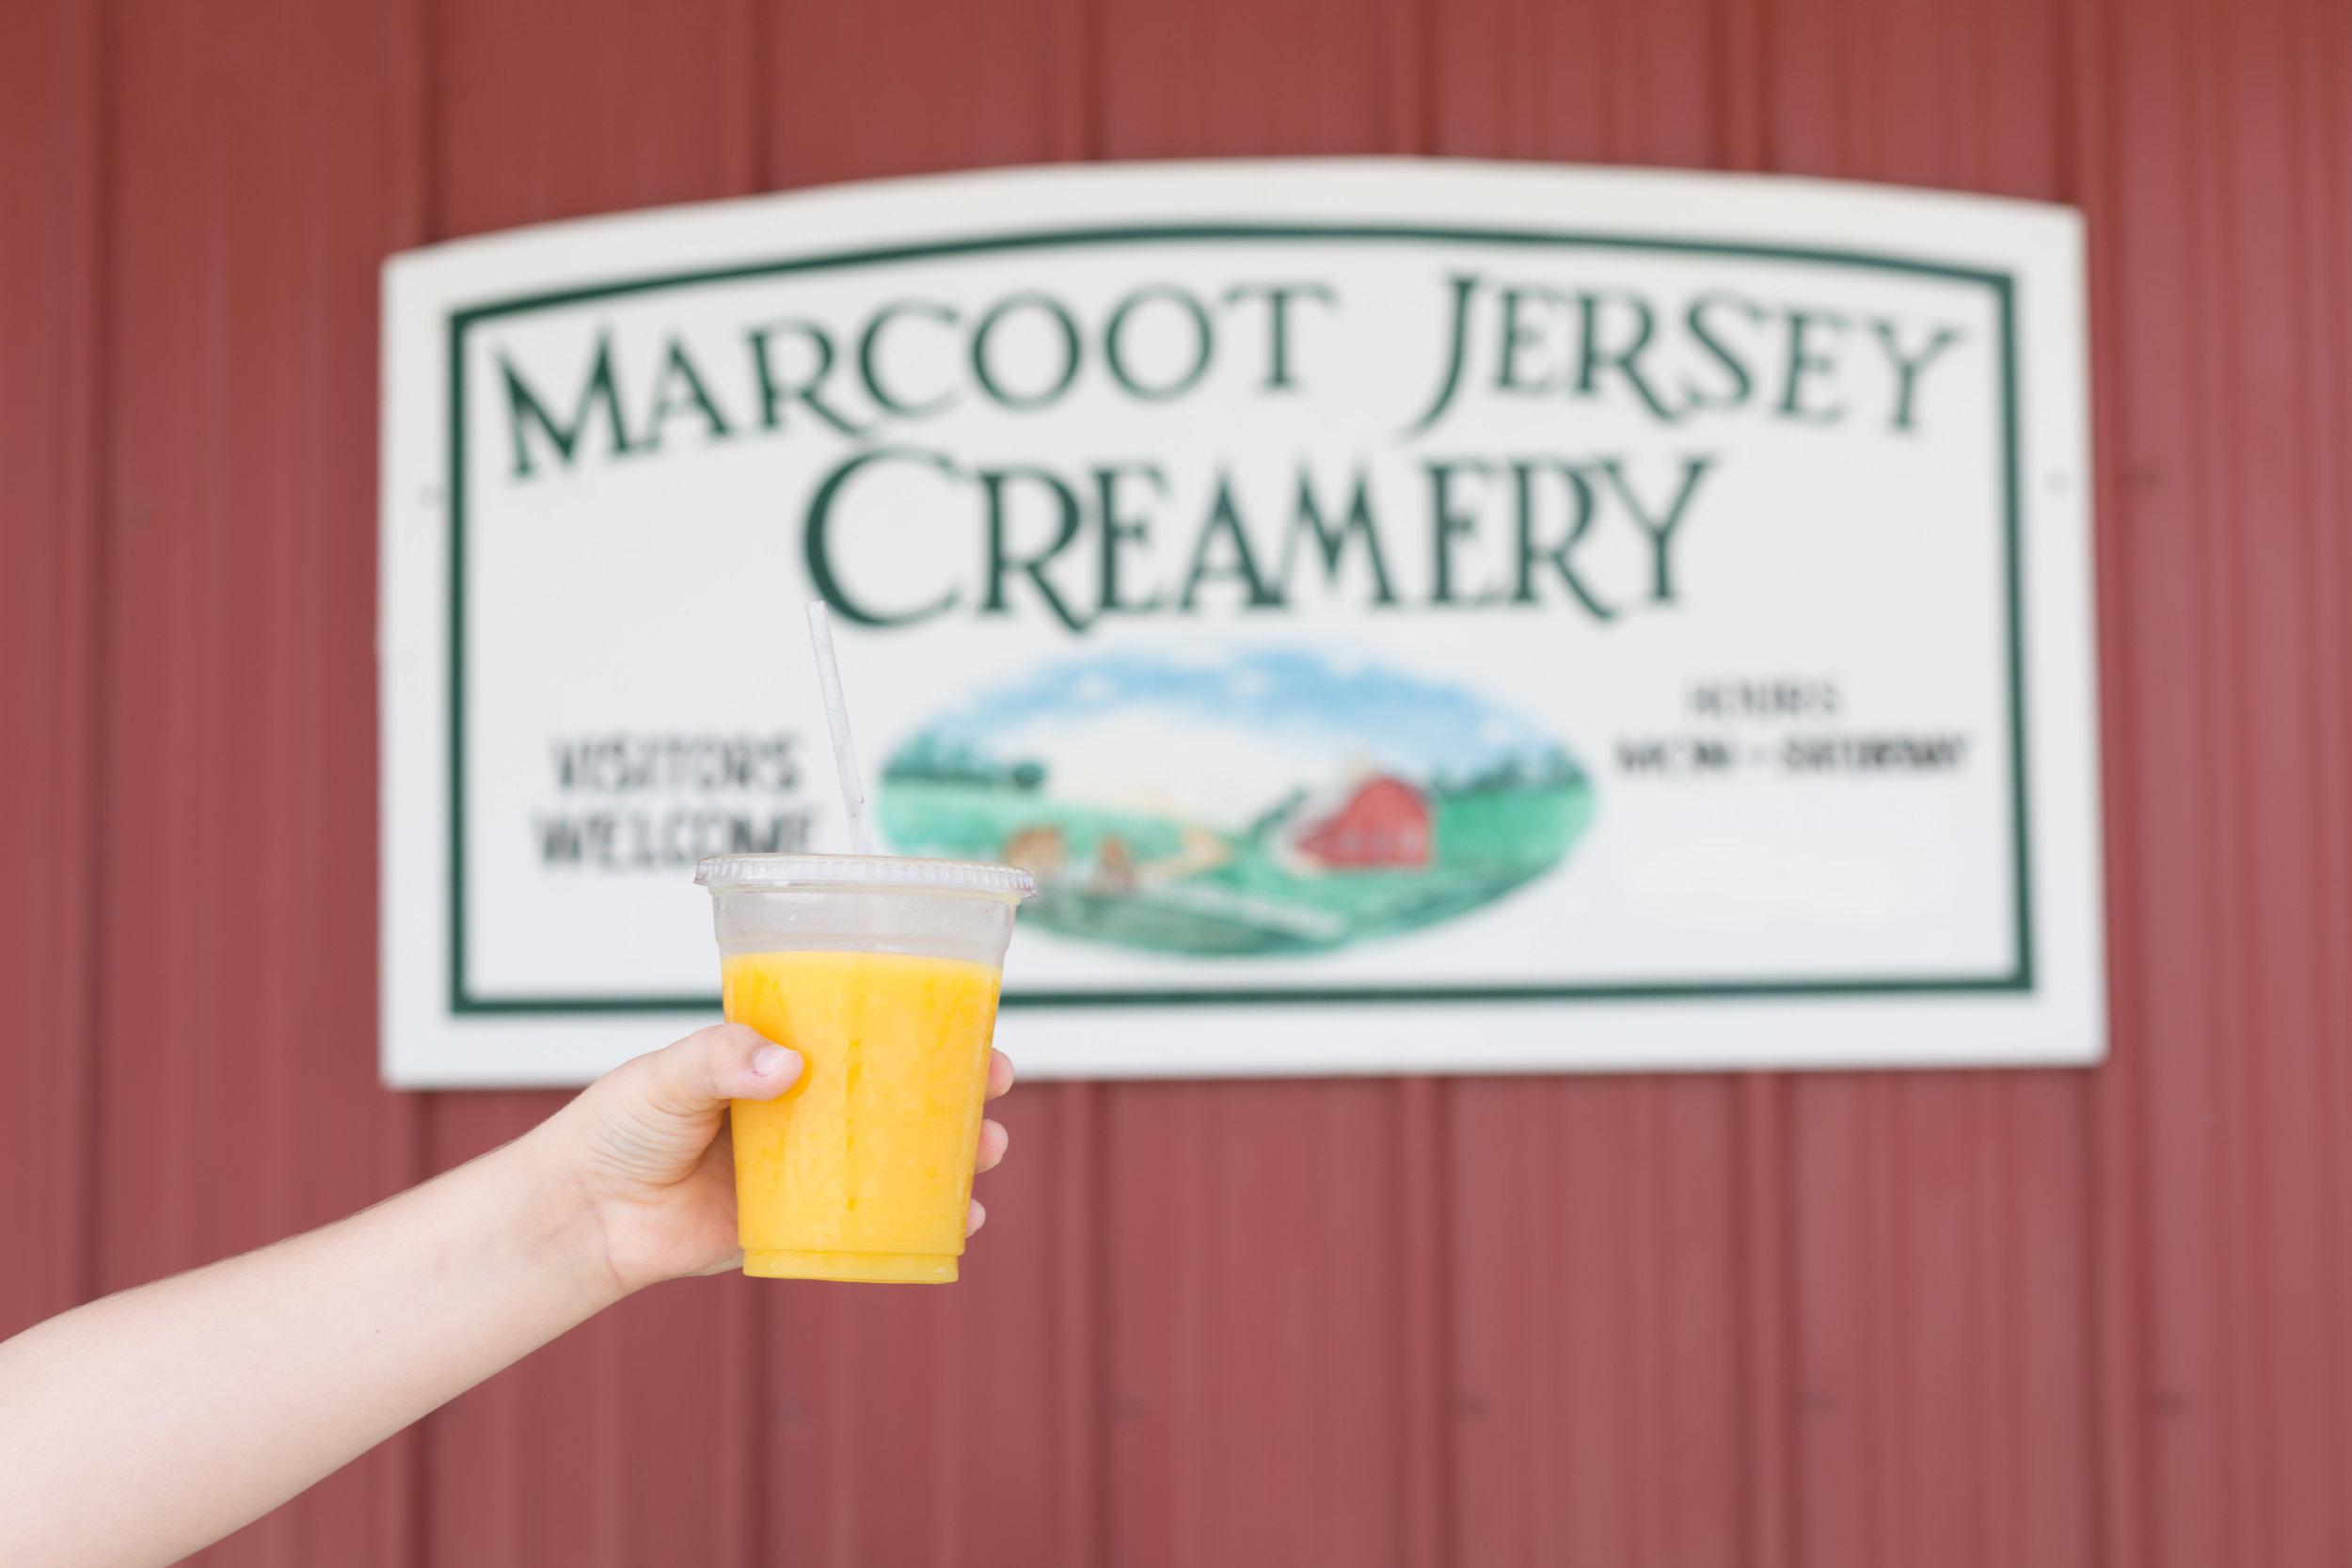 Marcoot Jersey Creamery Whey Ice-127.jpg